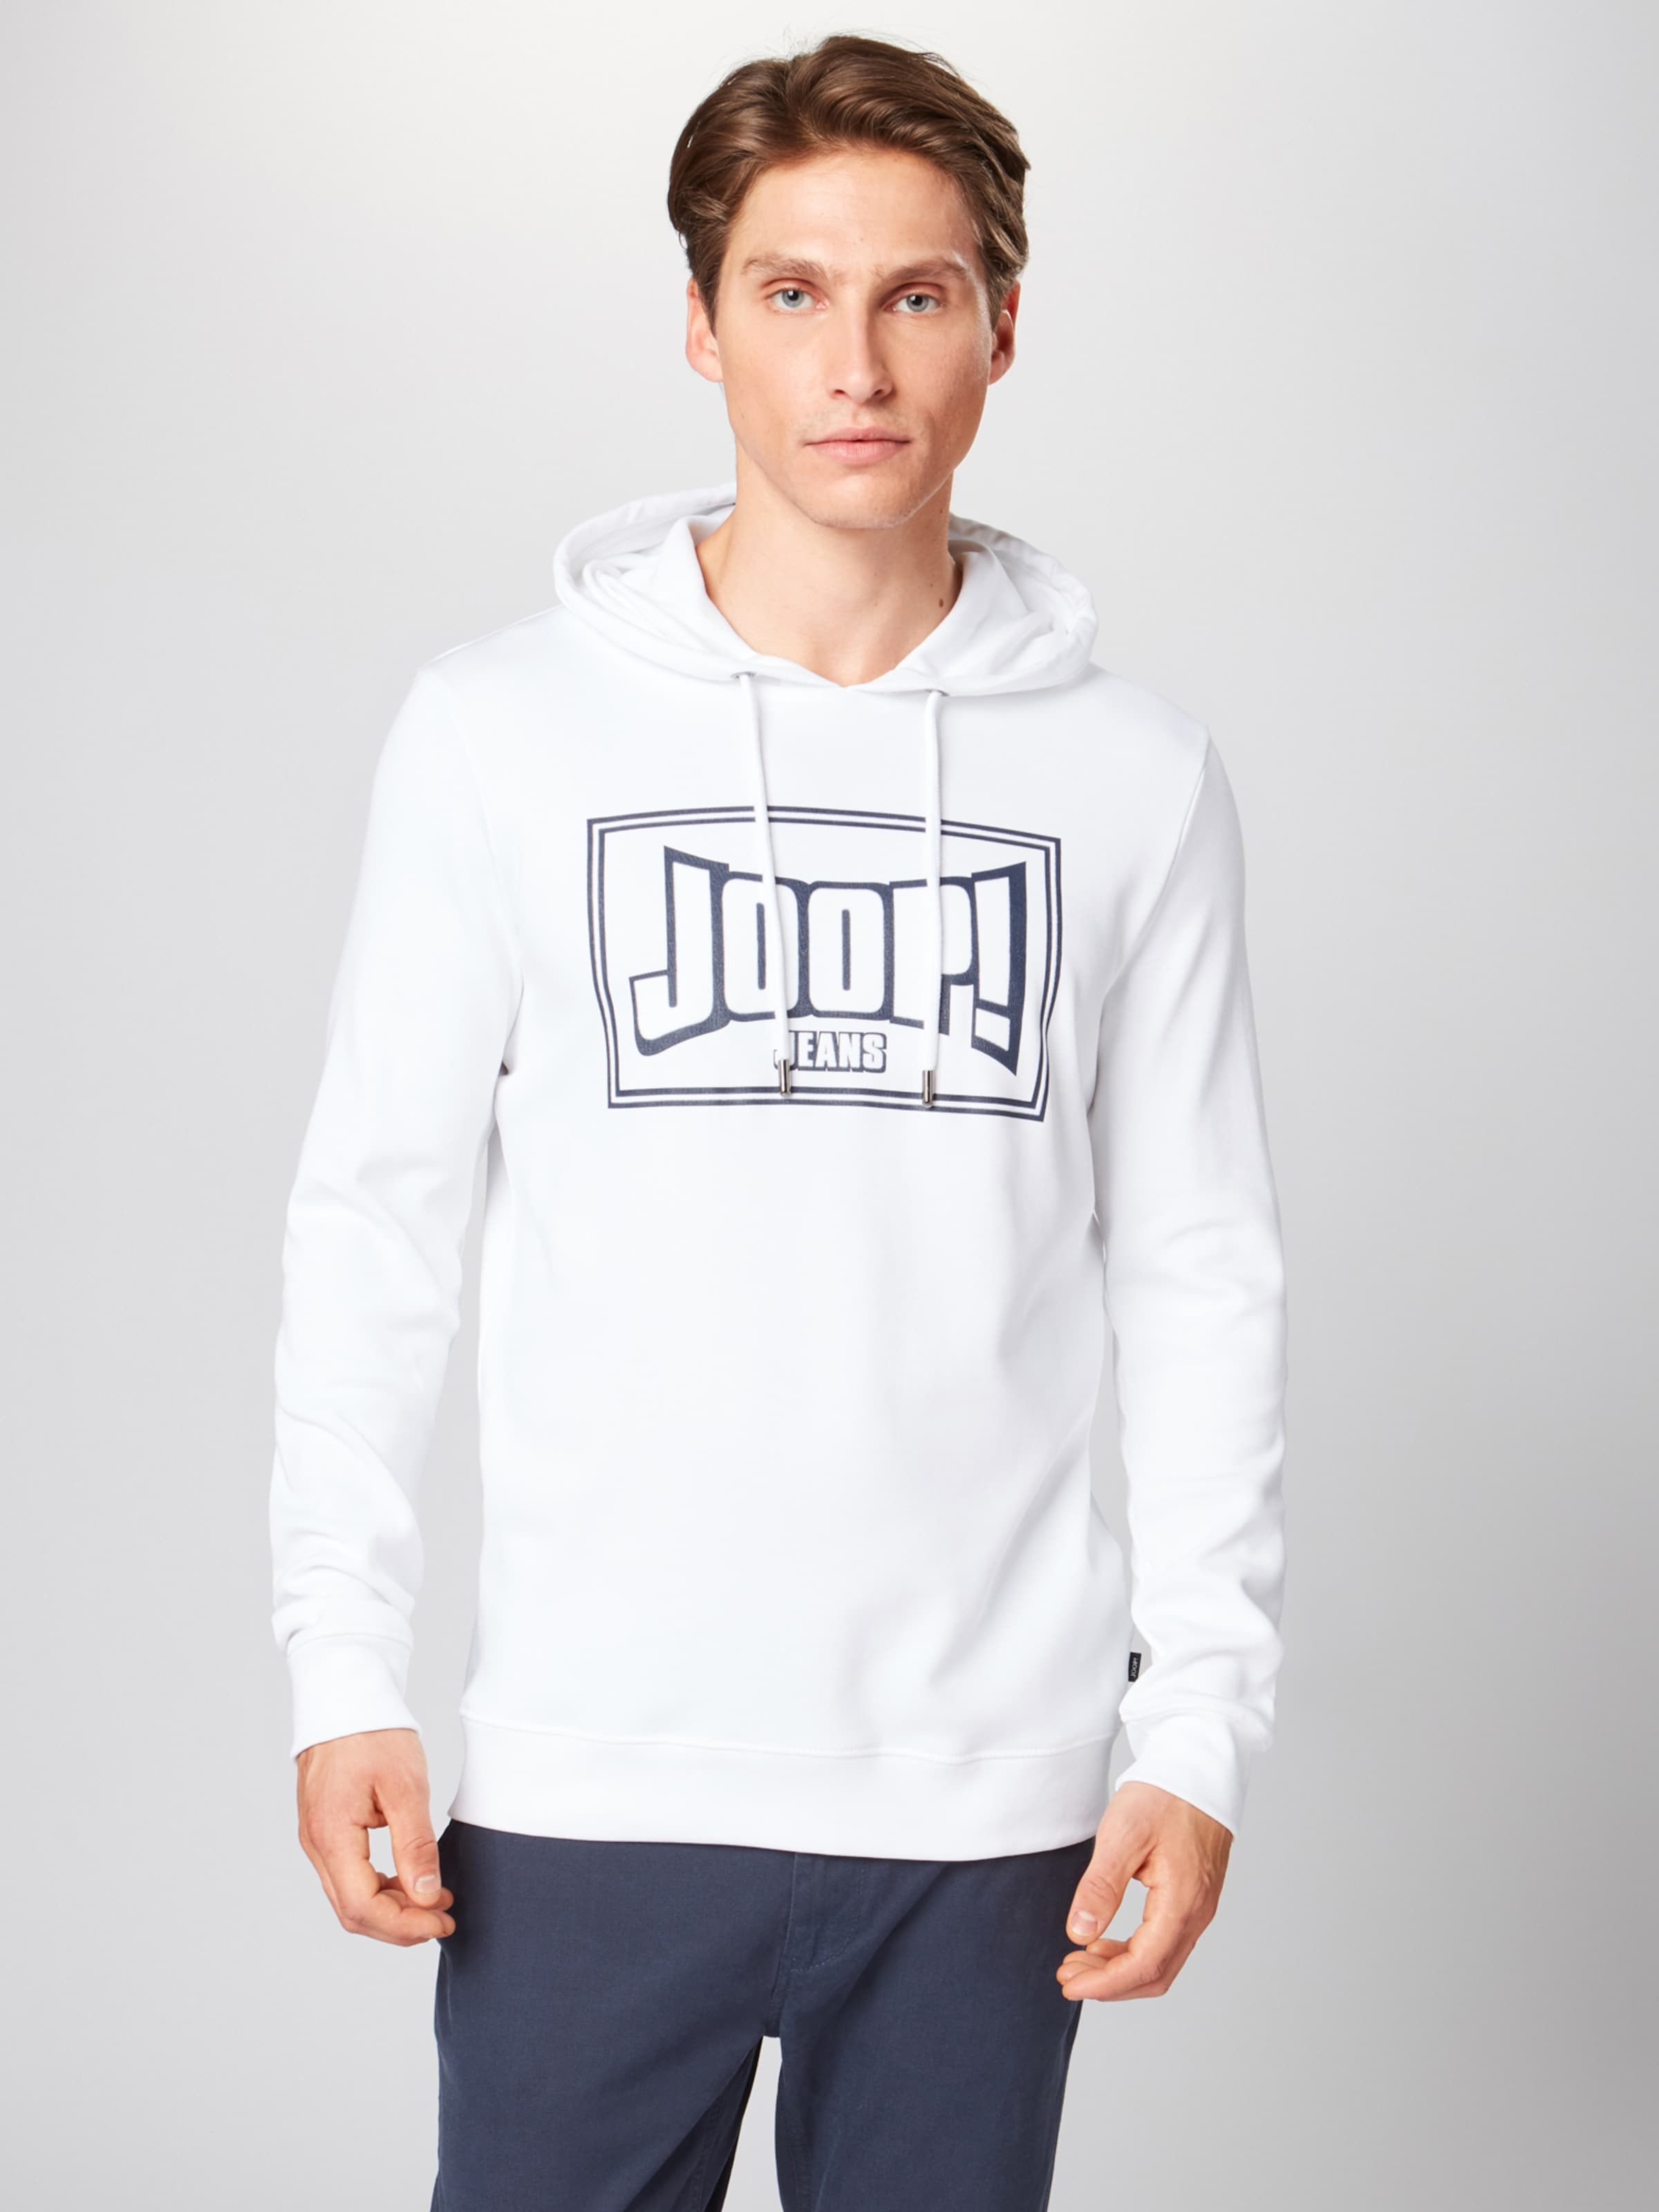 Jjj DunkelgrauWeiß 02alarik '15 10001835' In JoopSweatshirt 35cjALq4R